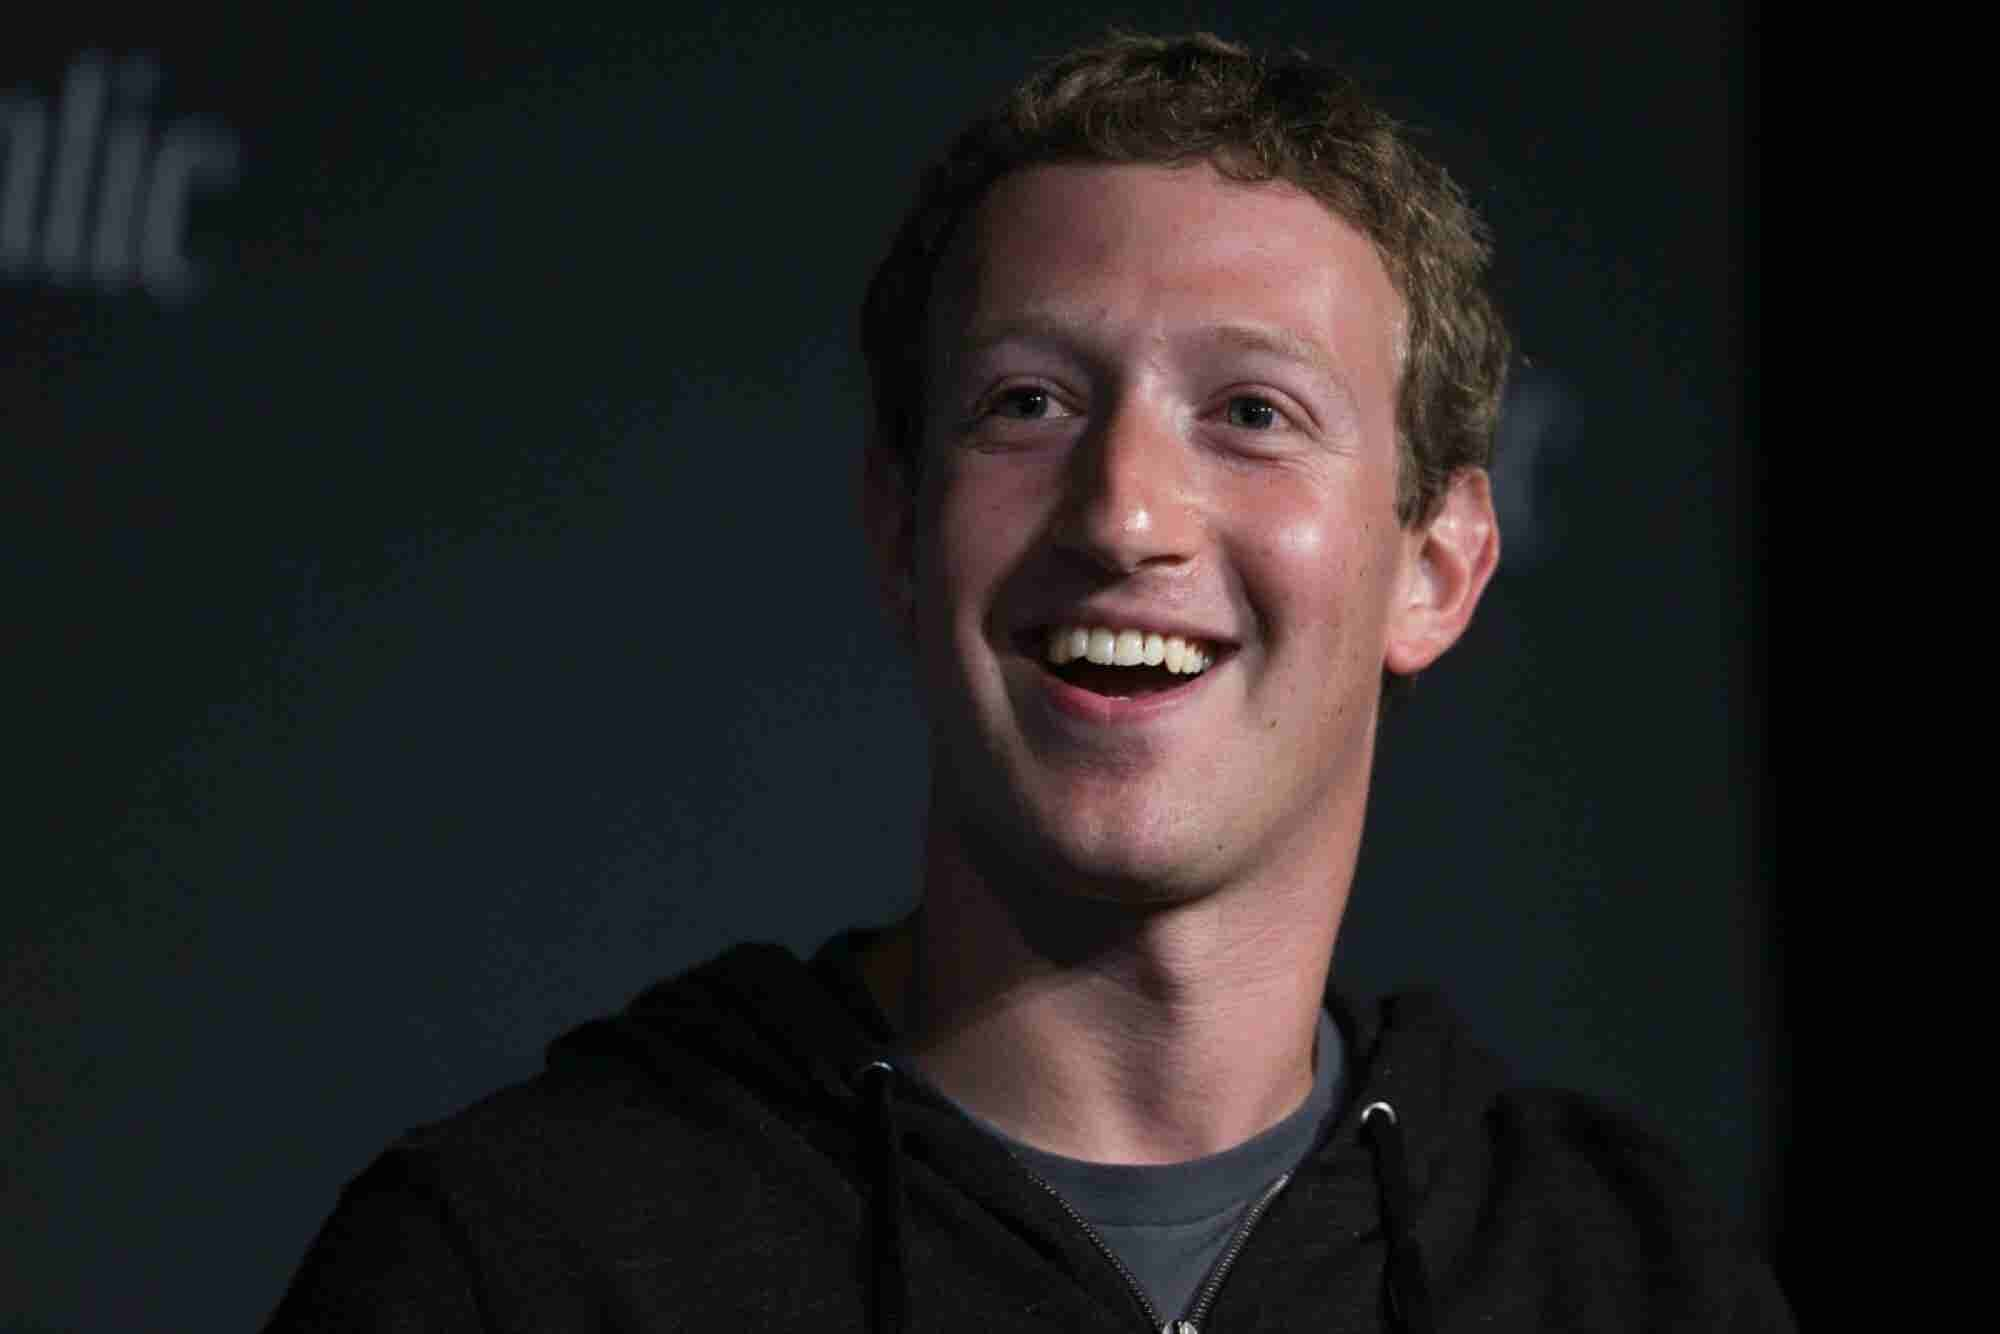 5 Ways Mark Zuckerberg Took Risks, for Better or Worse